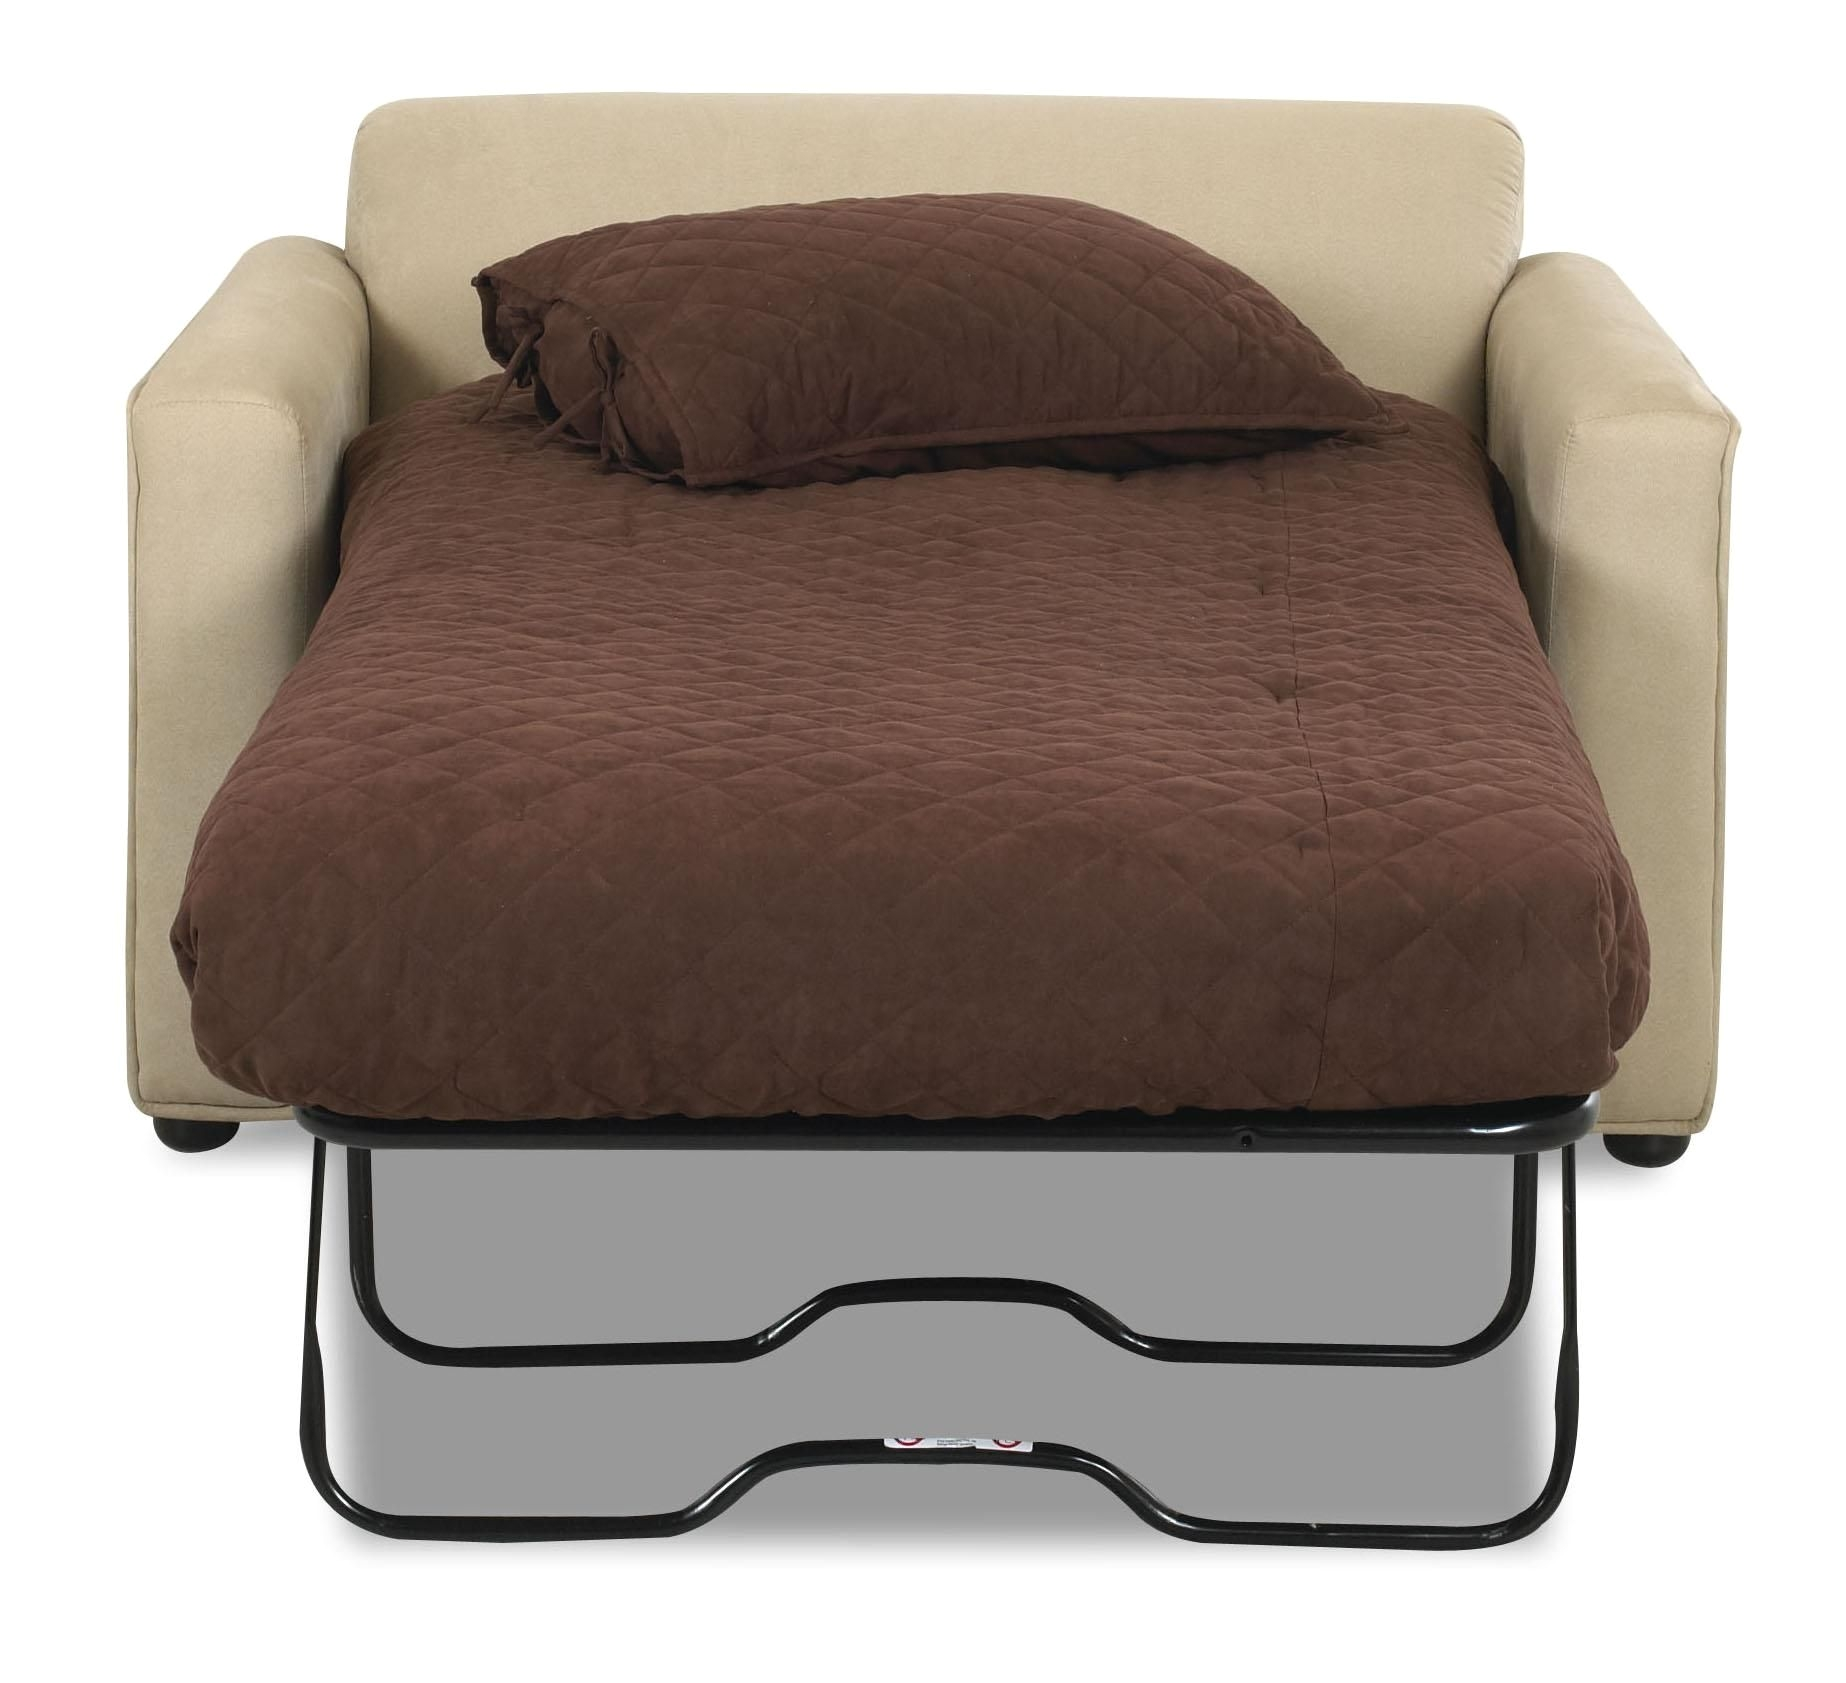 Sketch of Twin Size Sleeper Sofa